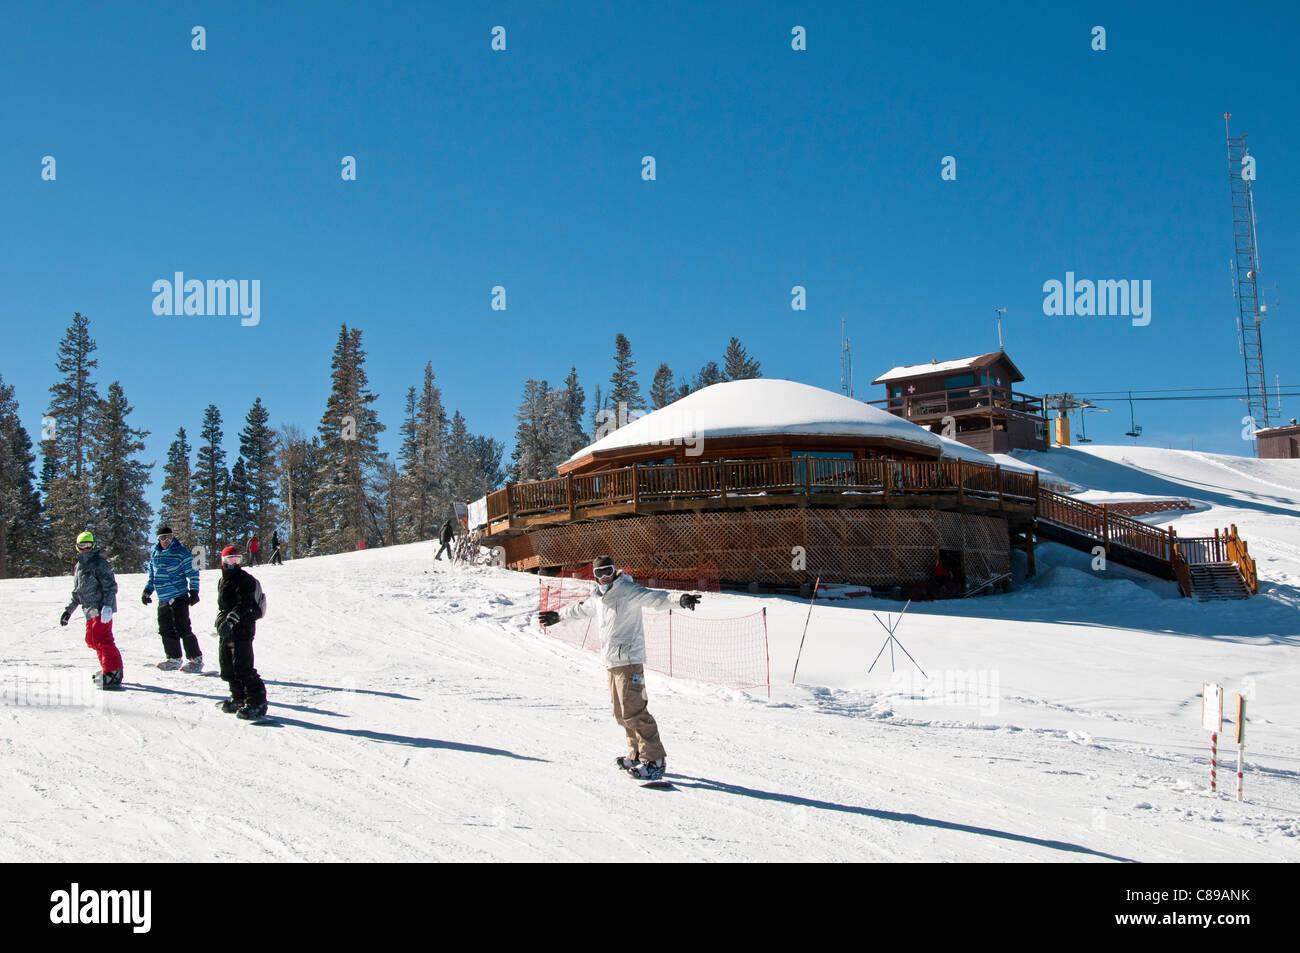 Summit Haus Restaurant, Angel Fire Resort, Angel Fire, New Mexico. - Stock Image